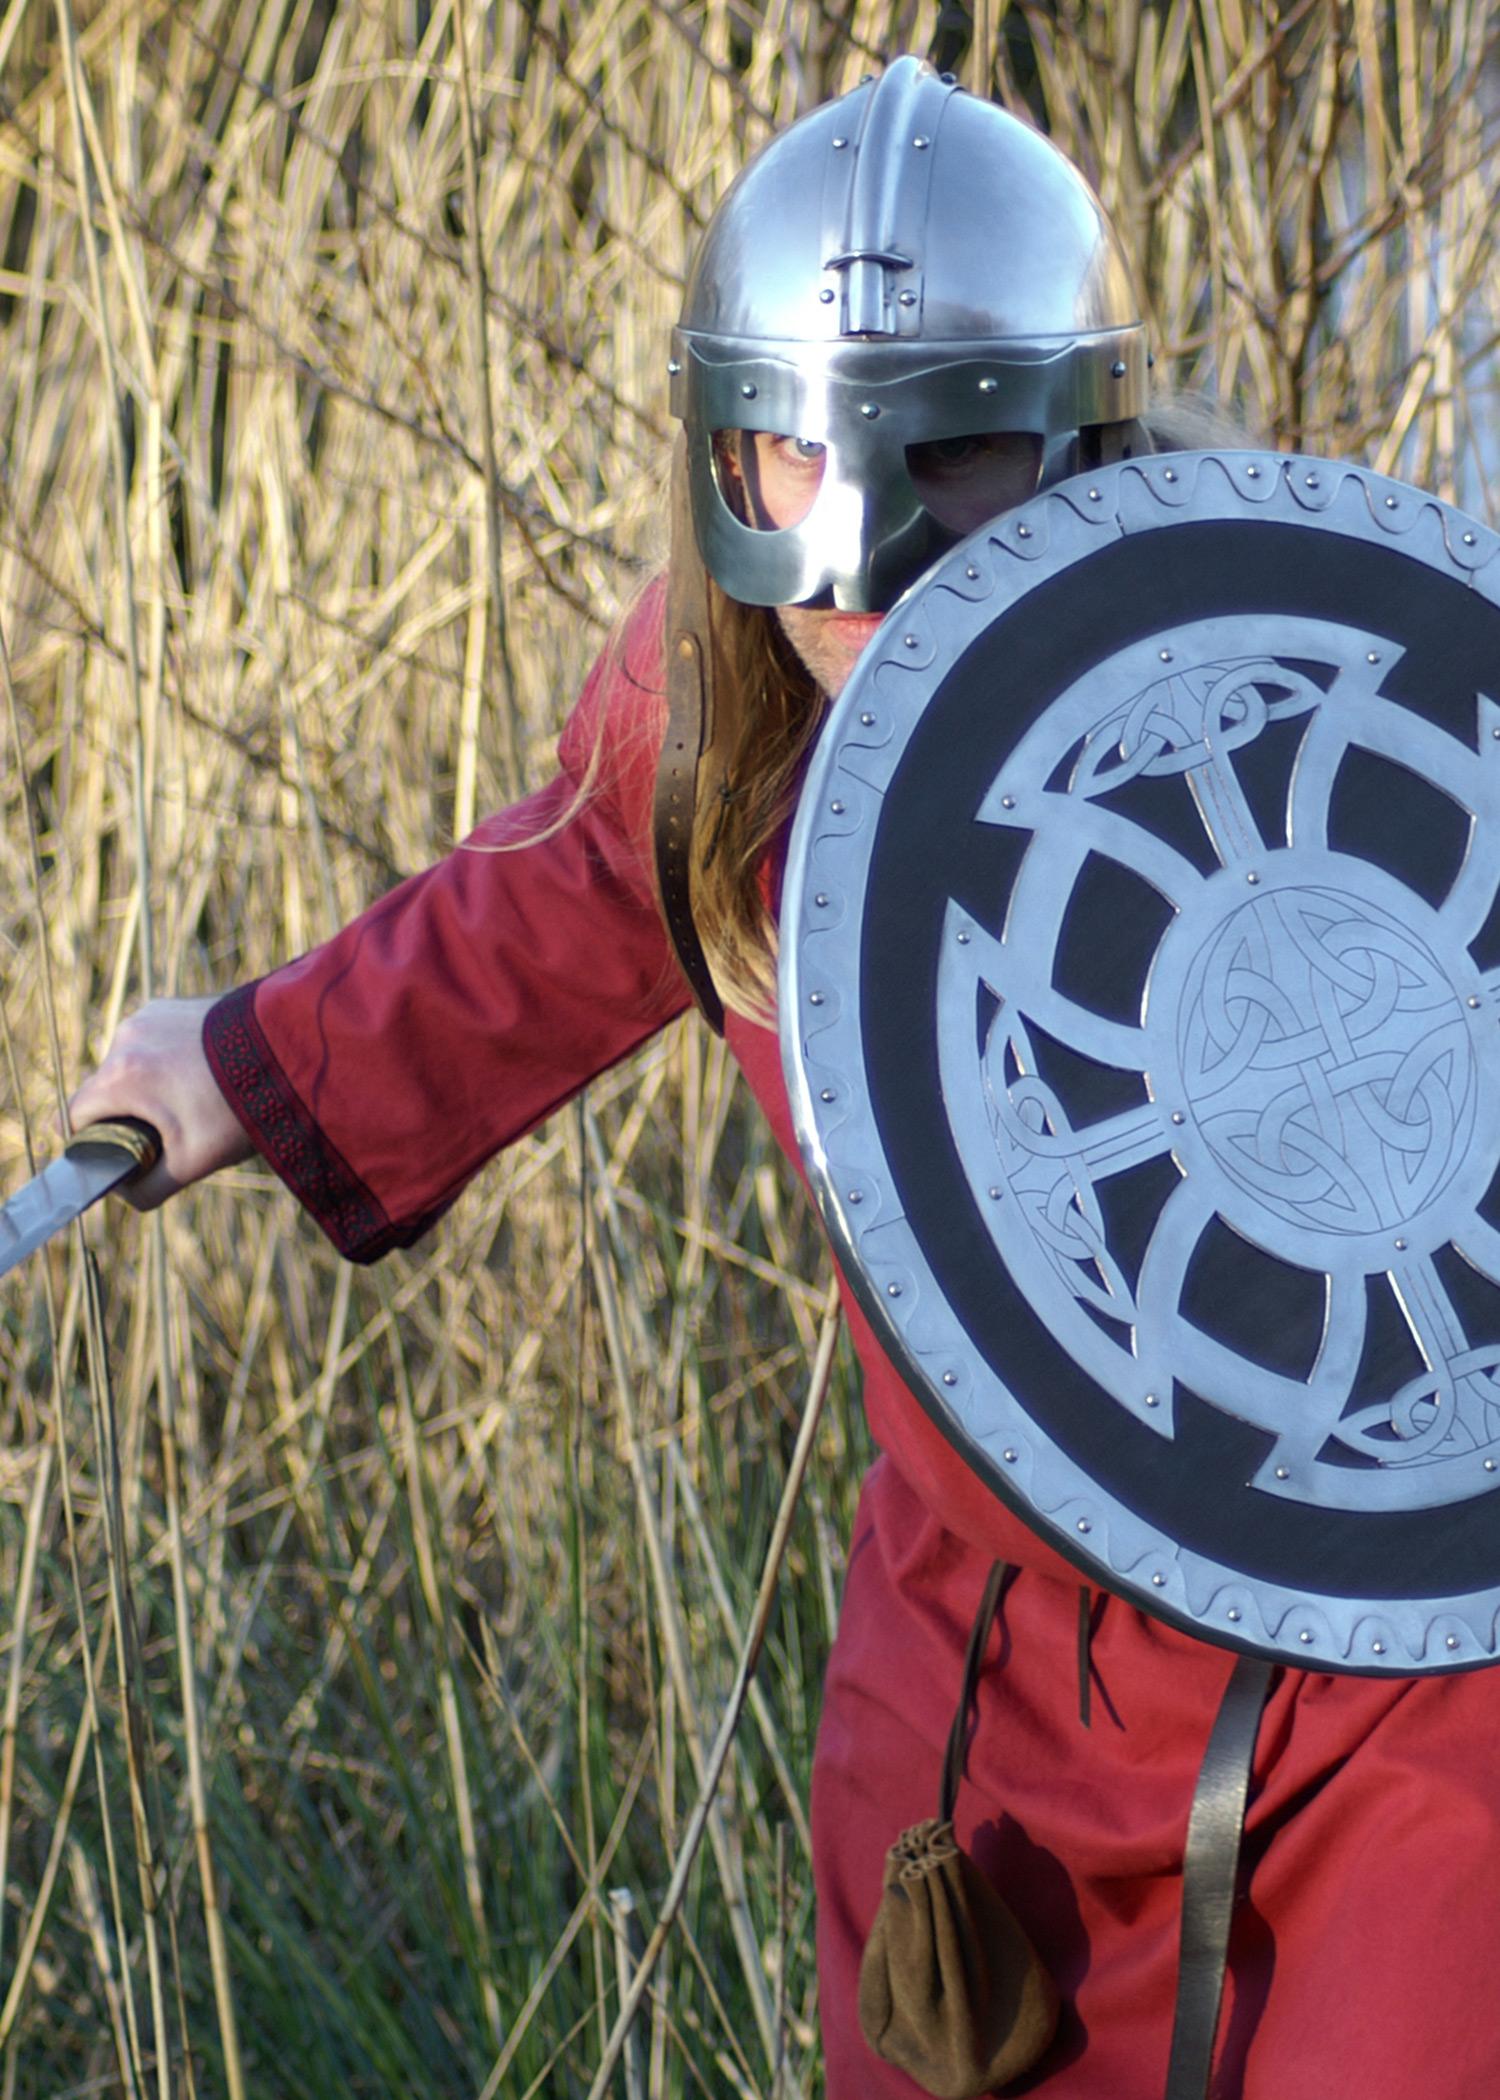 rot,Mittelalter Gewandung LARP Reenactment Römer Tunika mit Bordüre